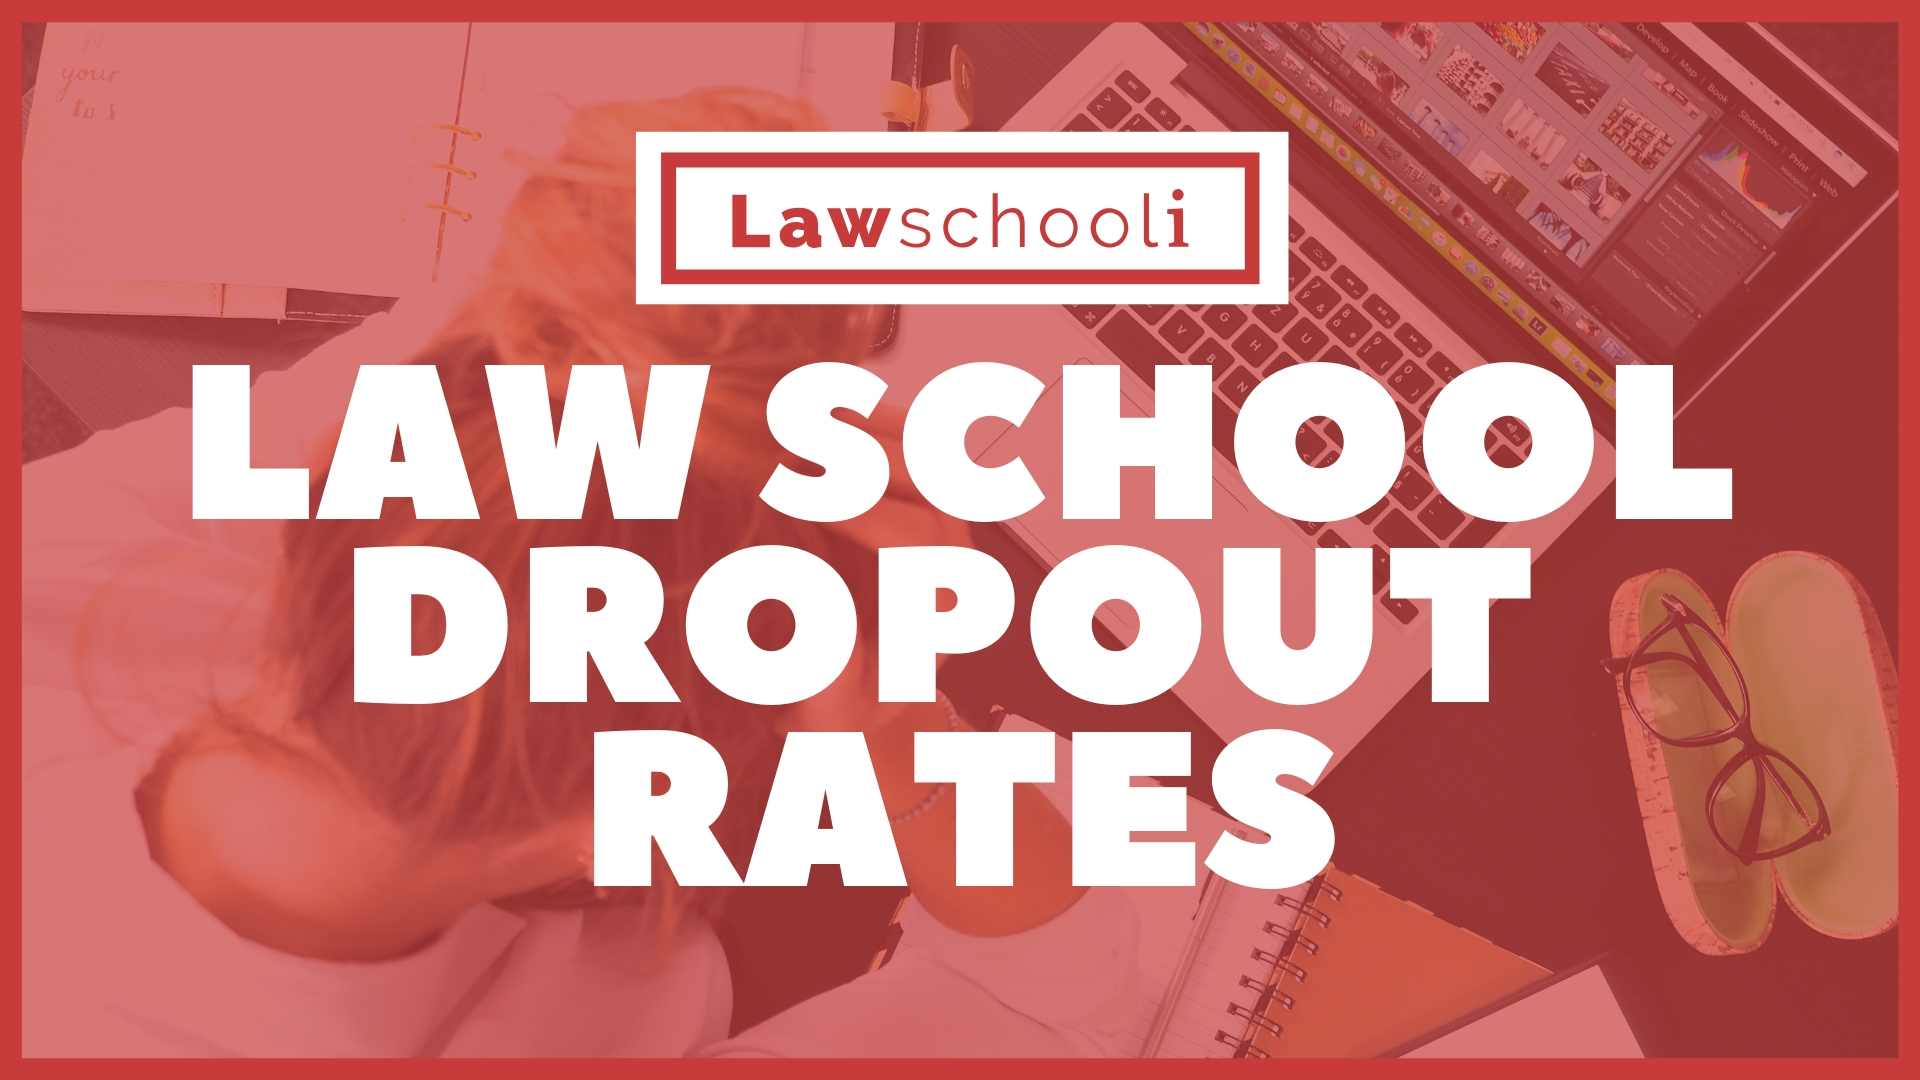 Law School Dropout Rates - LawSchooli